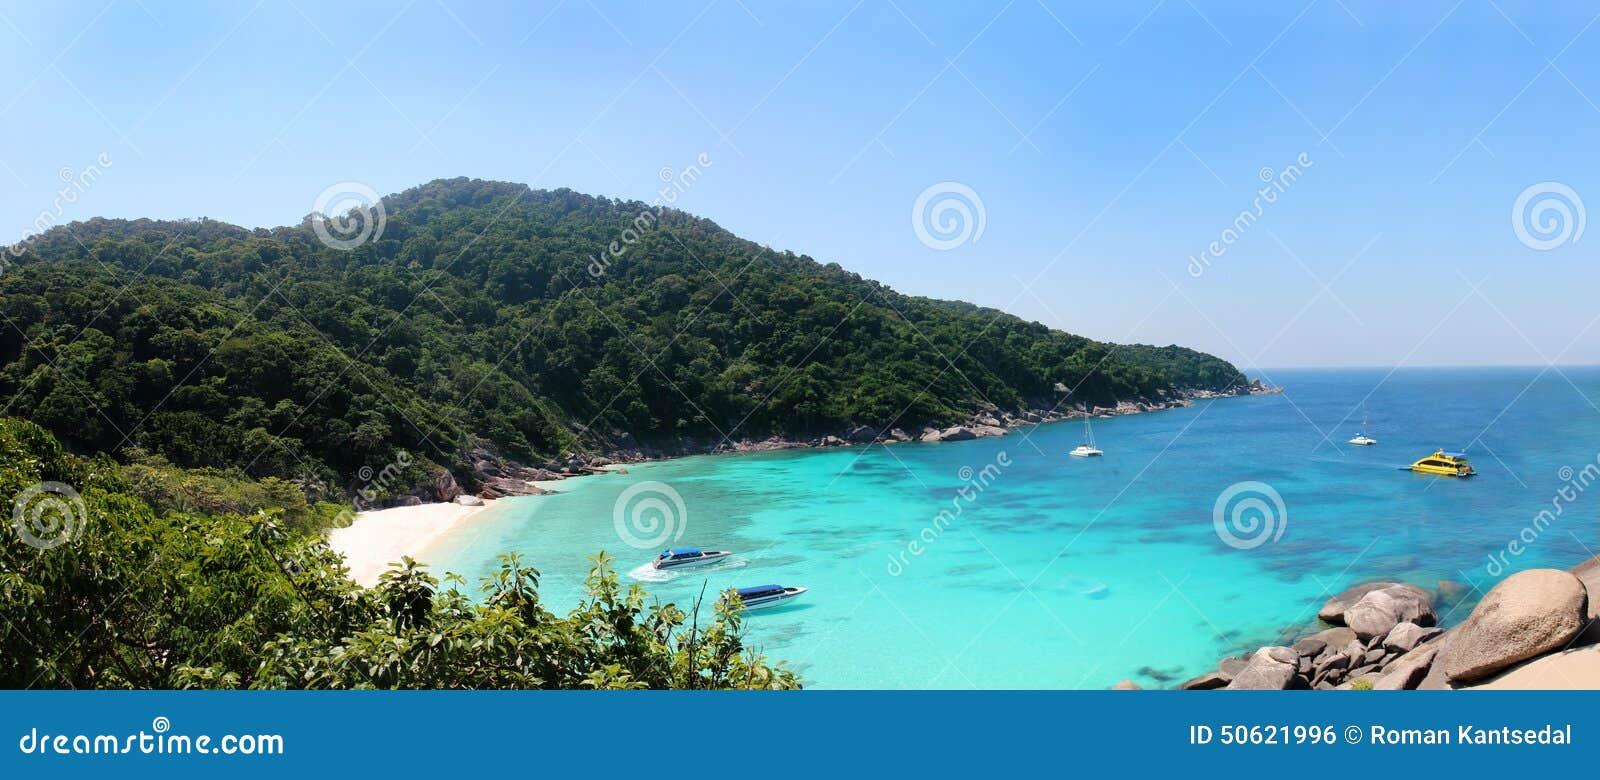 As ilhas de Similan latem - vista panorâmica de uma praia da rocha da vela, parque nacional das ilhas de Similan, mar de Andaman,